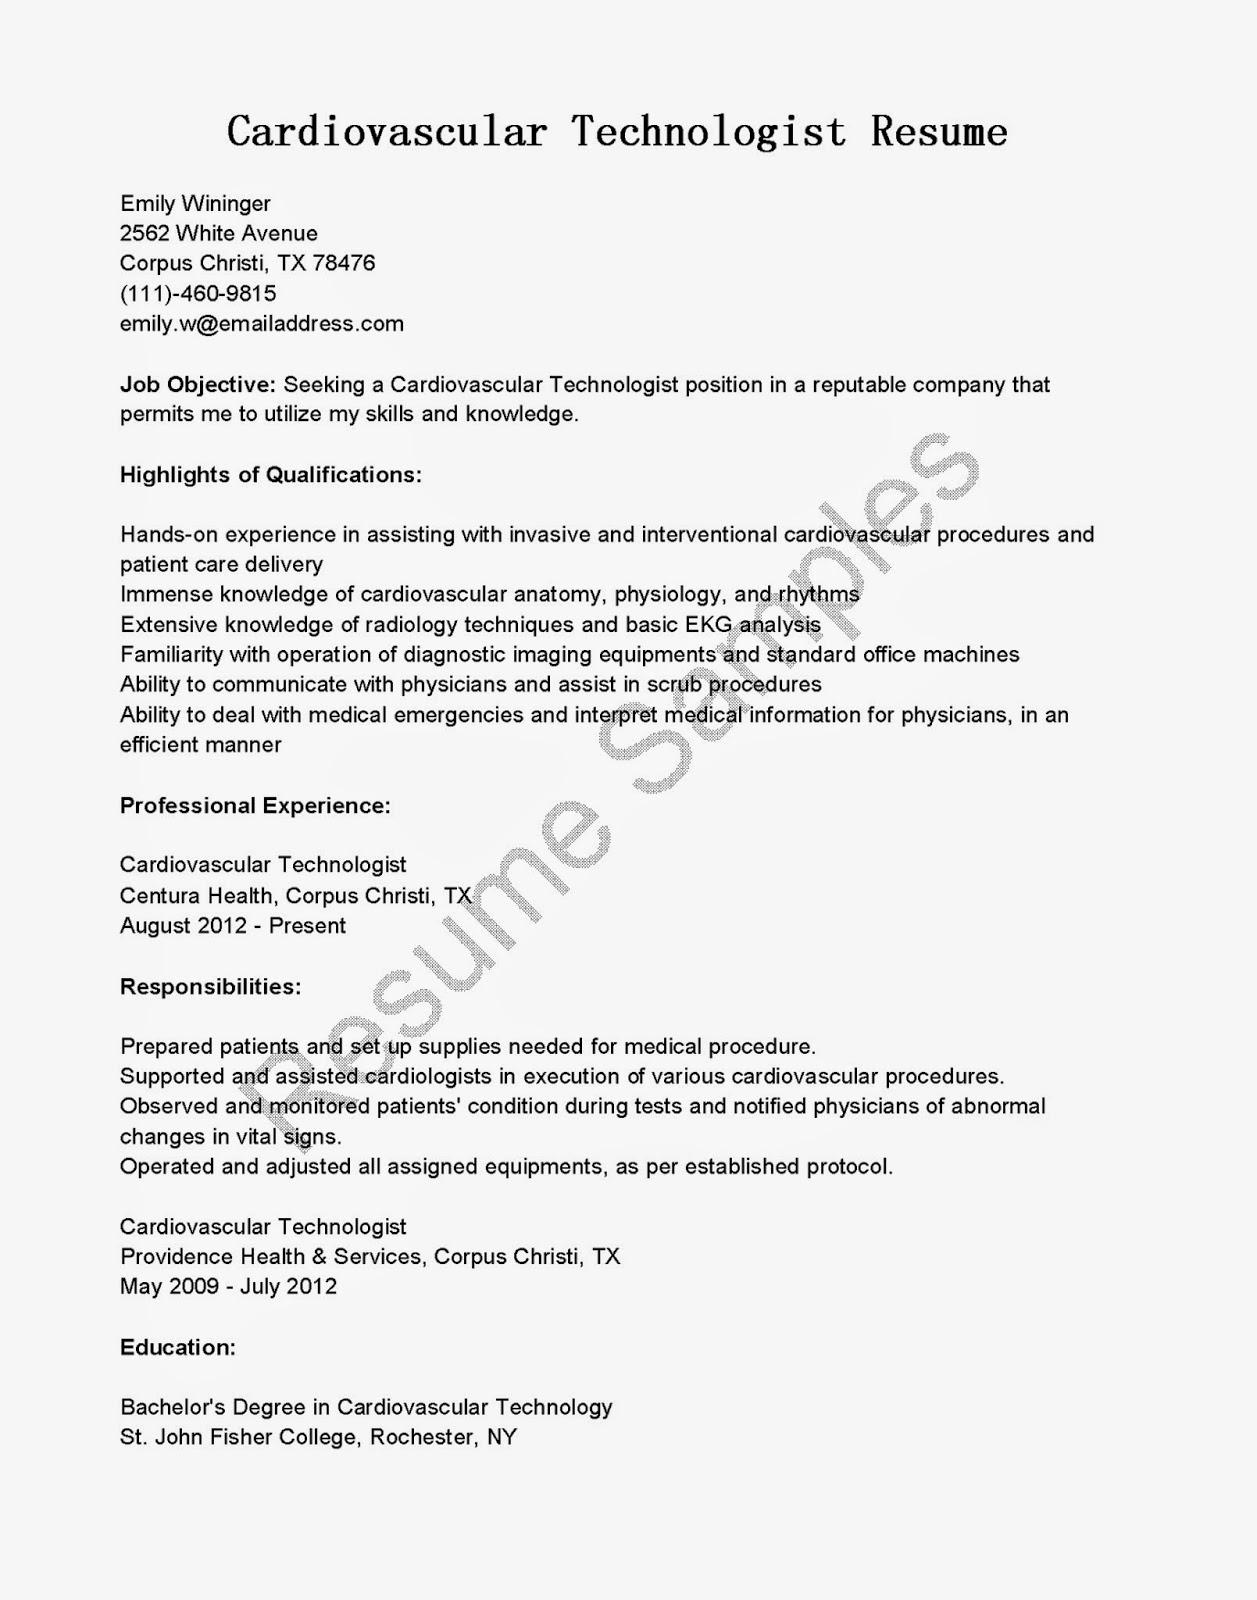 Resume Samples Cardiovascular Technologist Resume Sample